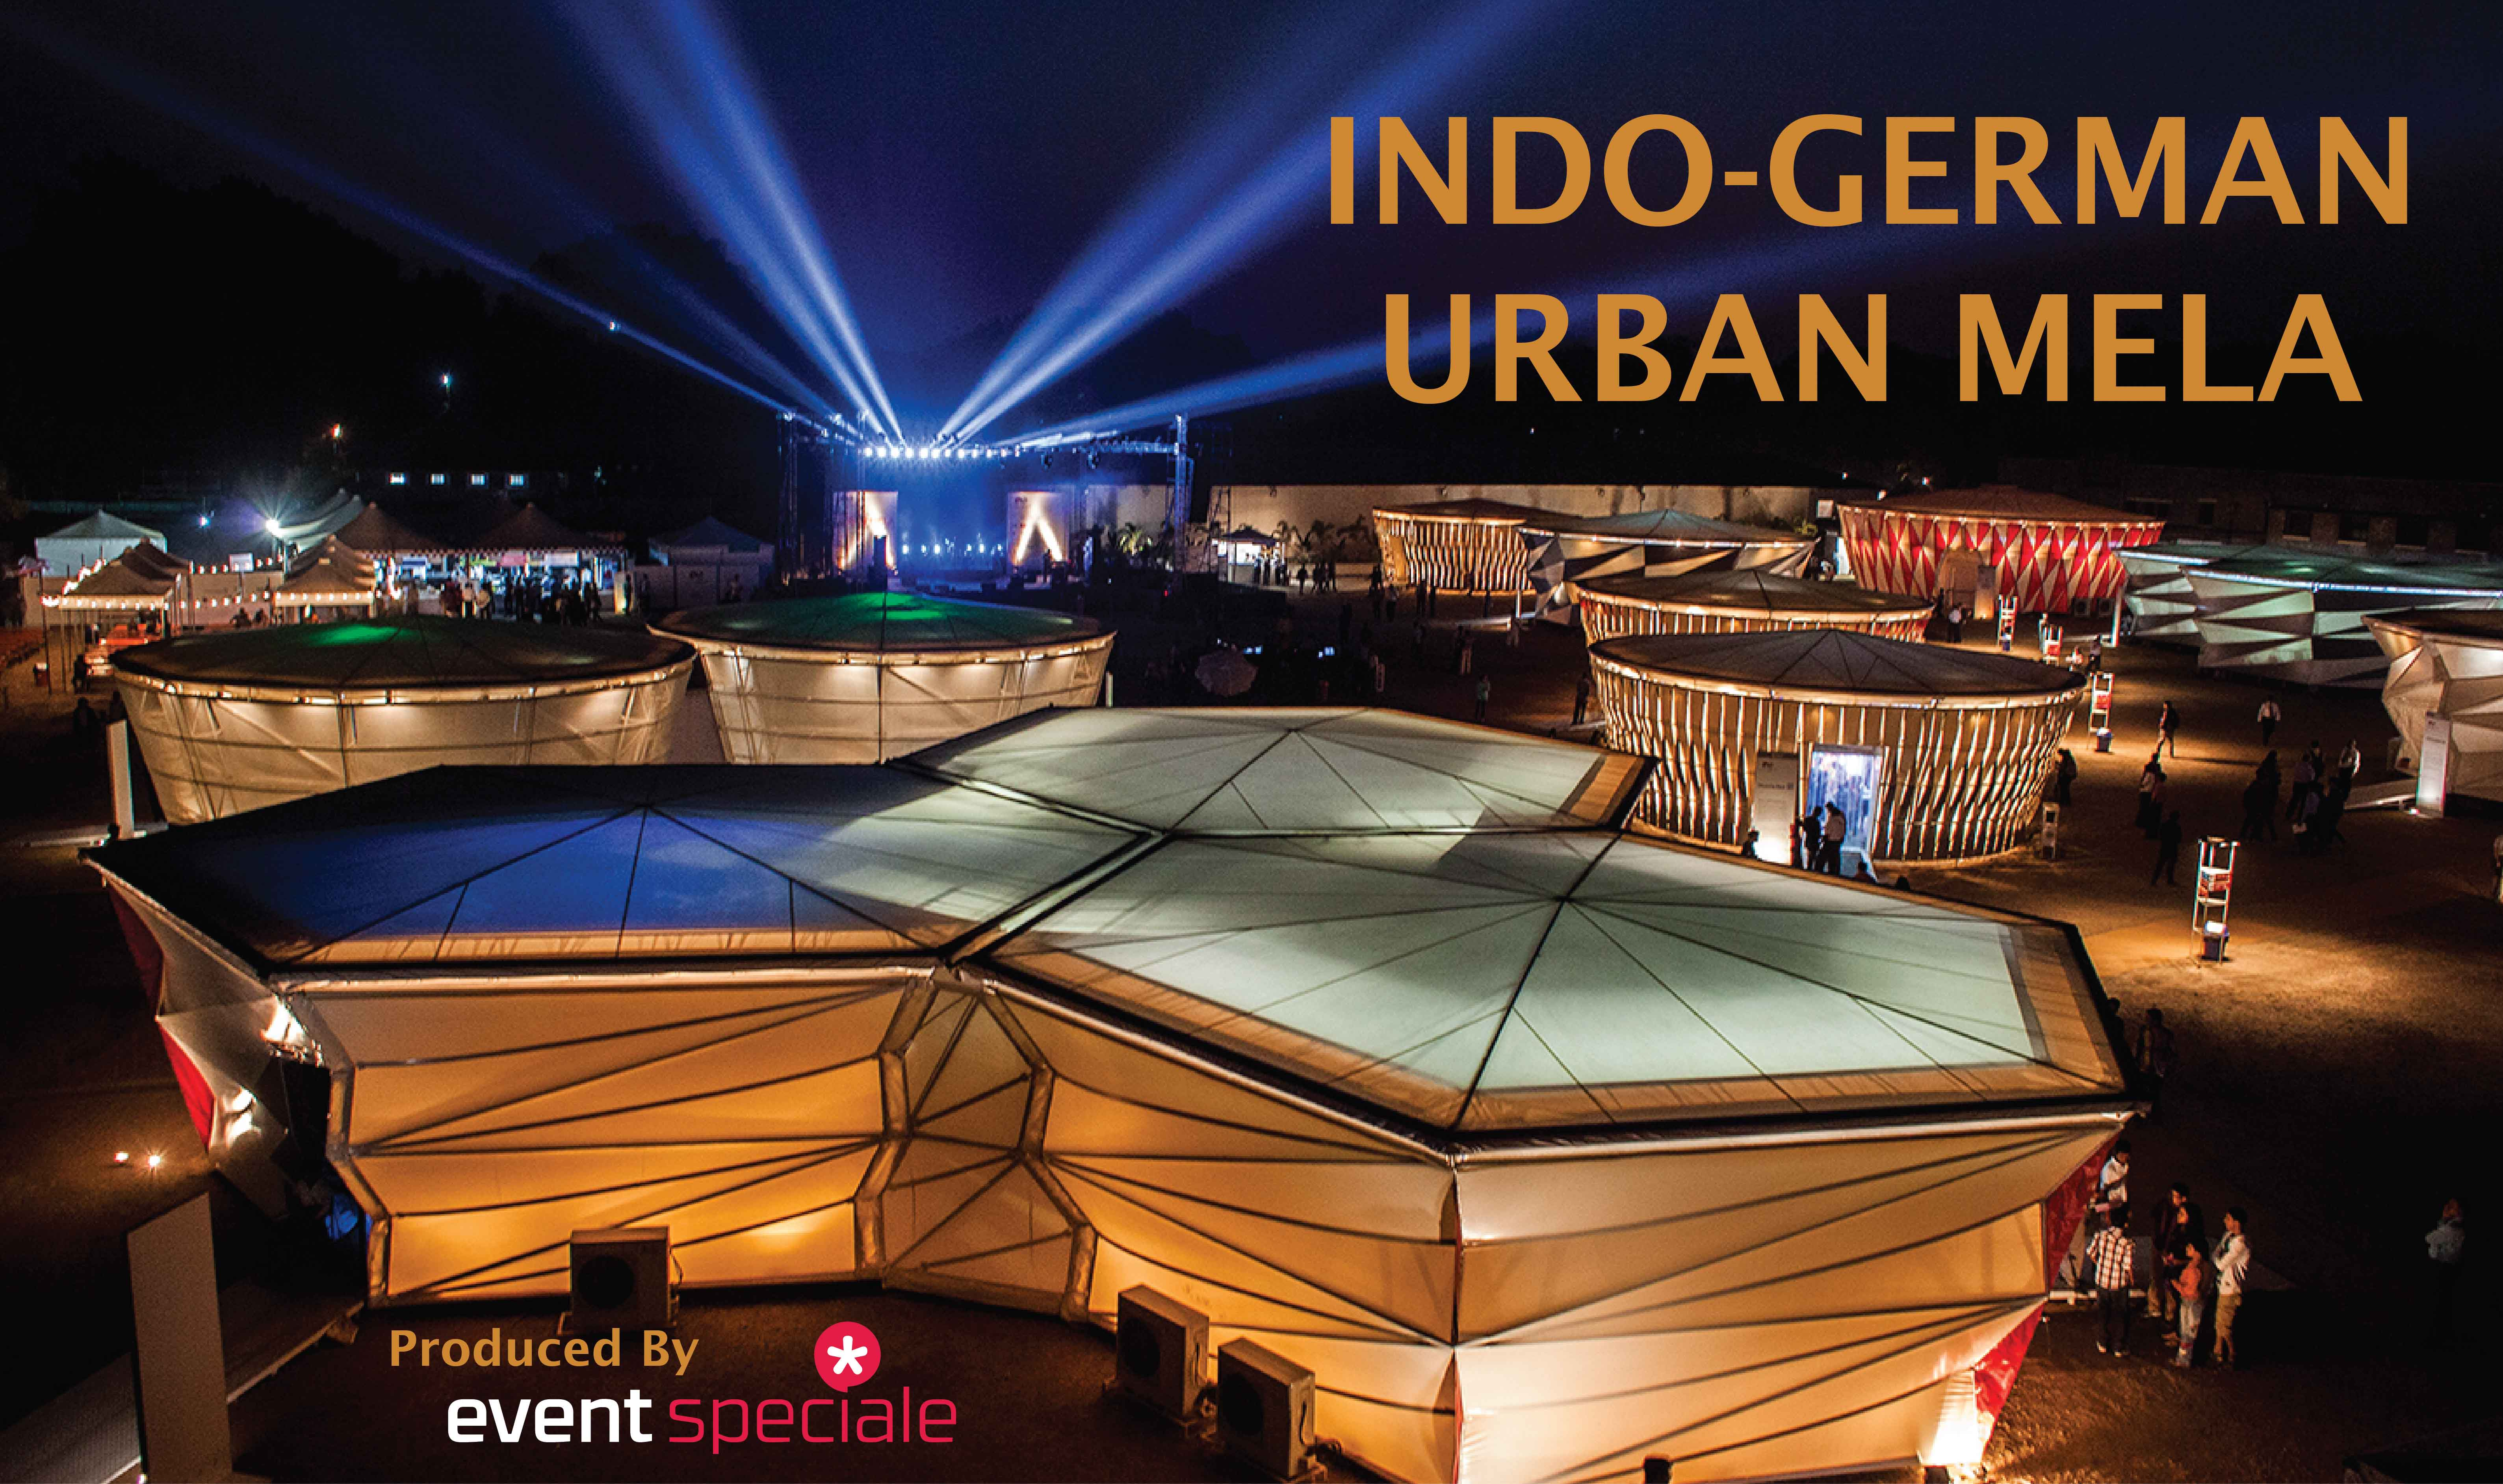 Indo-German Urban Mela